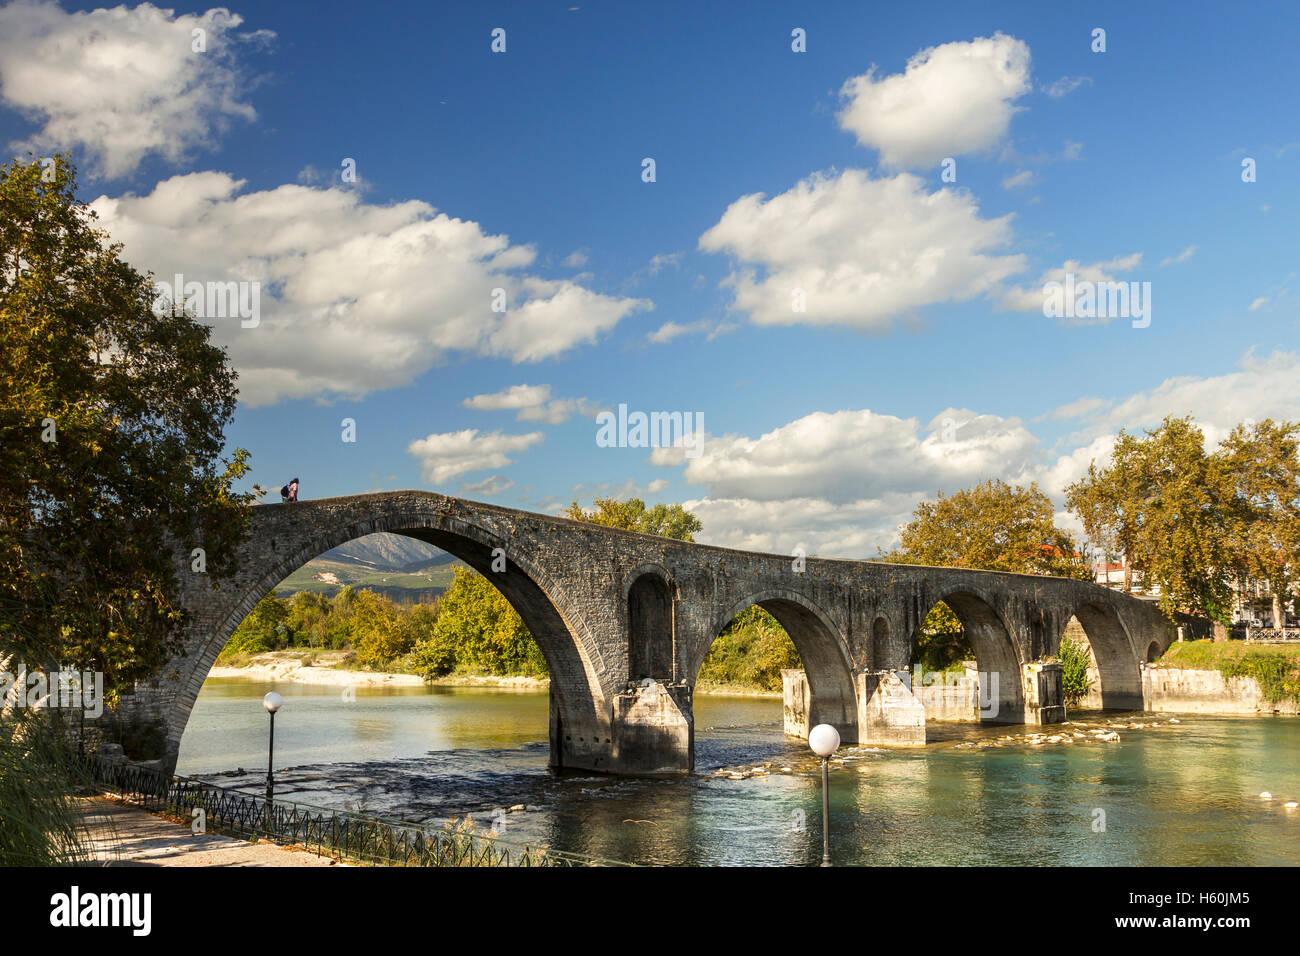 The legendary stone bridge of Arta, the most historic bridge in Greece. - Stock Image